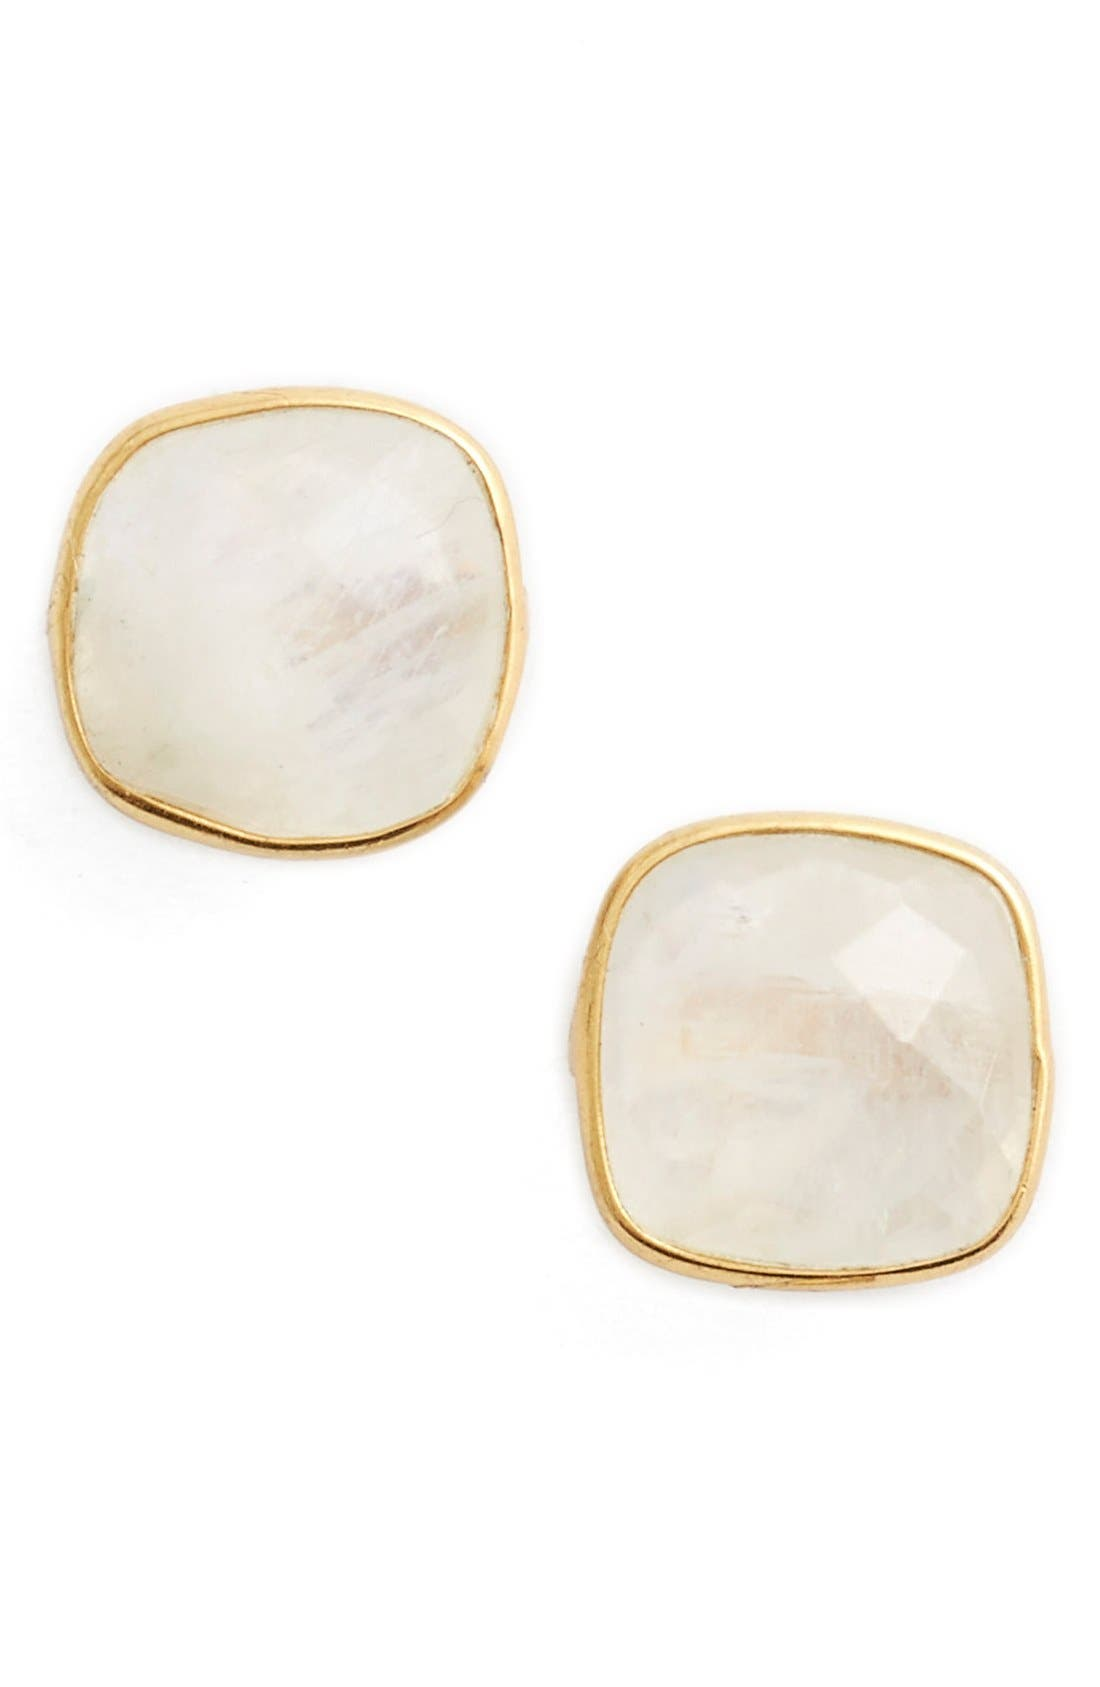 Alternate Image 1 Selected - Argento Vivo Semiprecious Stone Stud Earrings